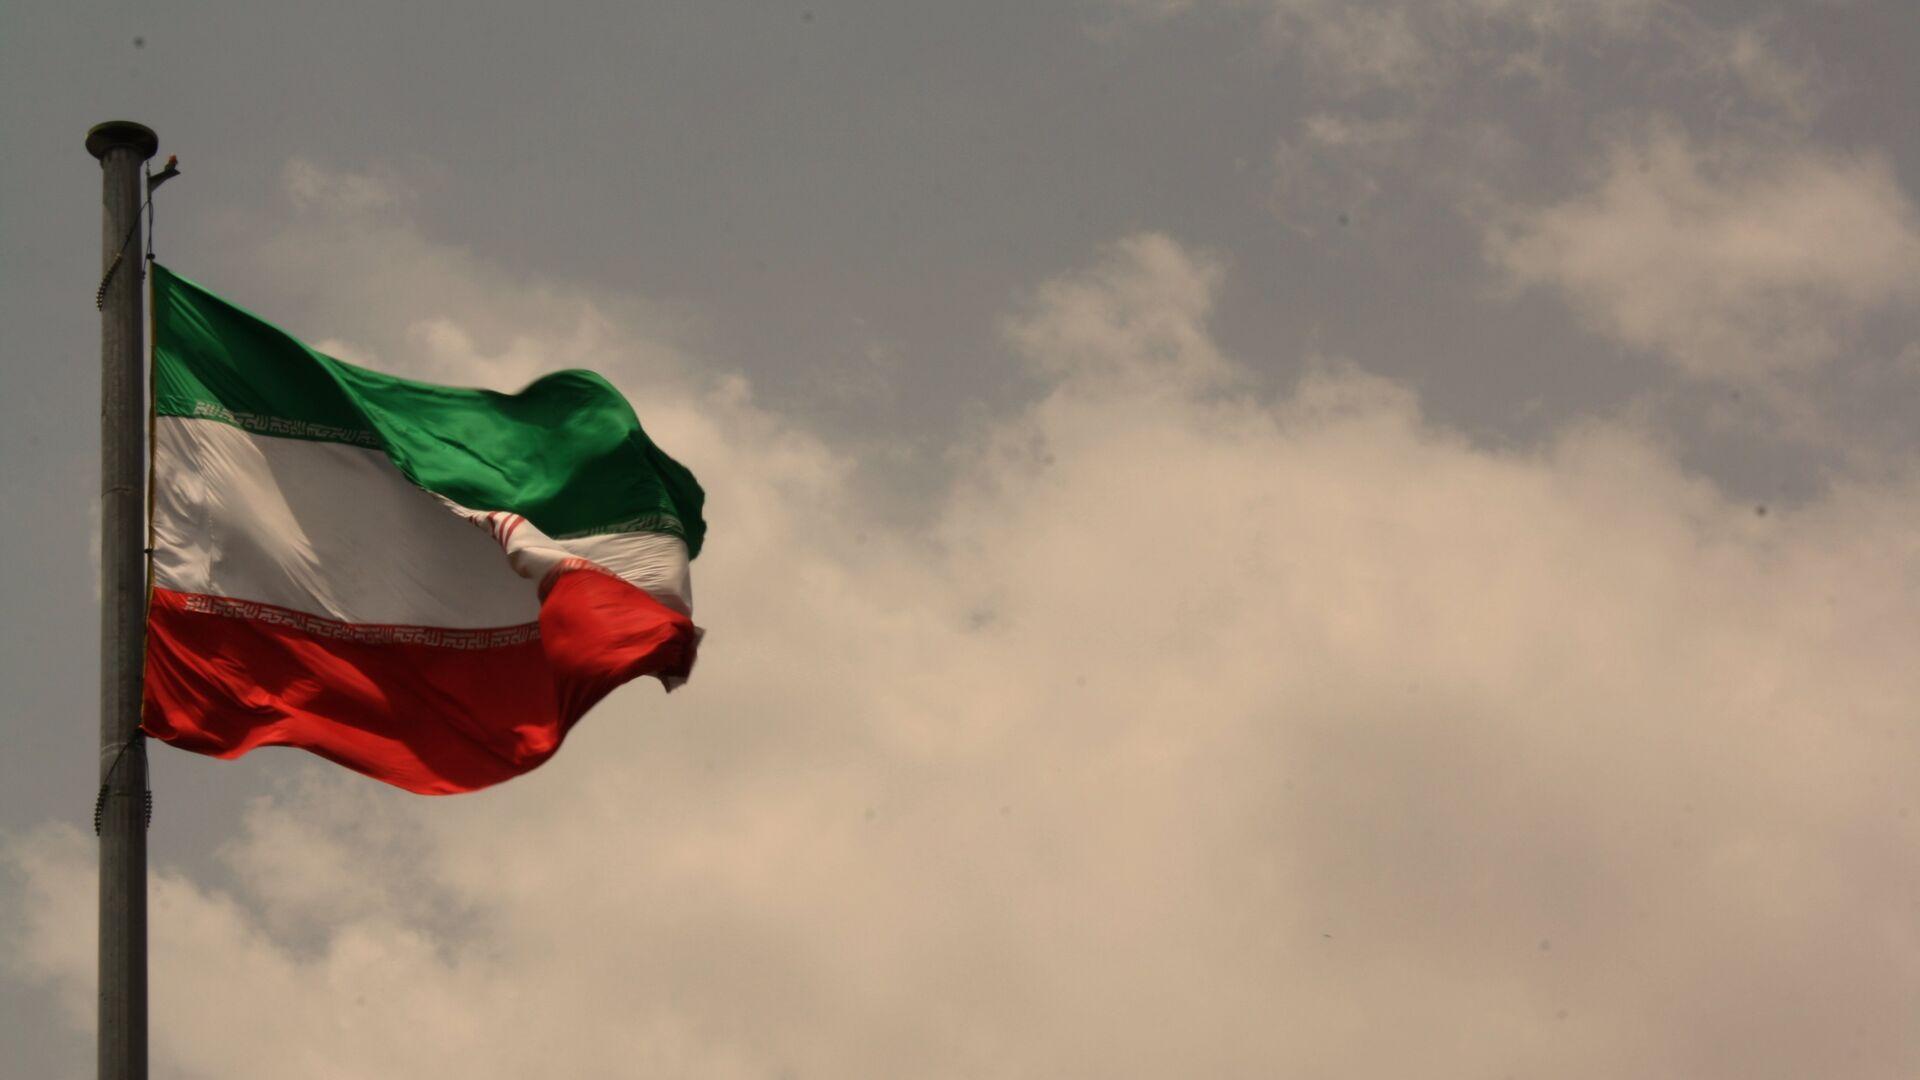 La bandera de Irán - Sputnik Mundo, 1920, 13.04.2021